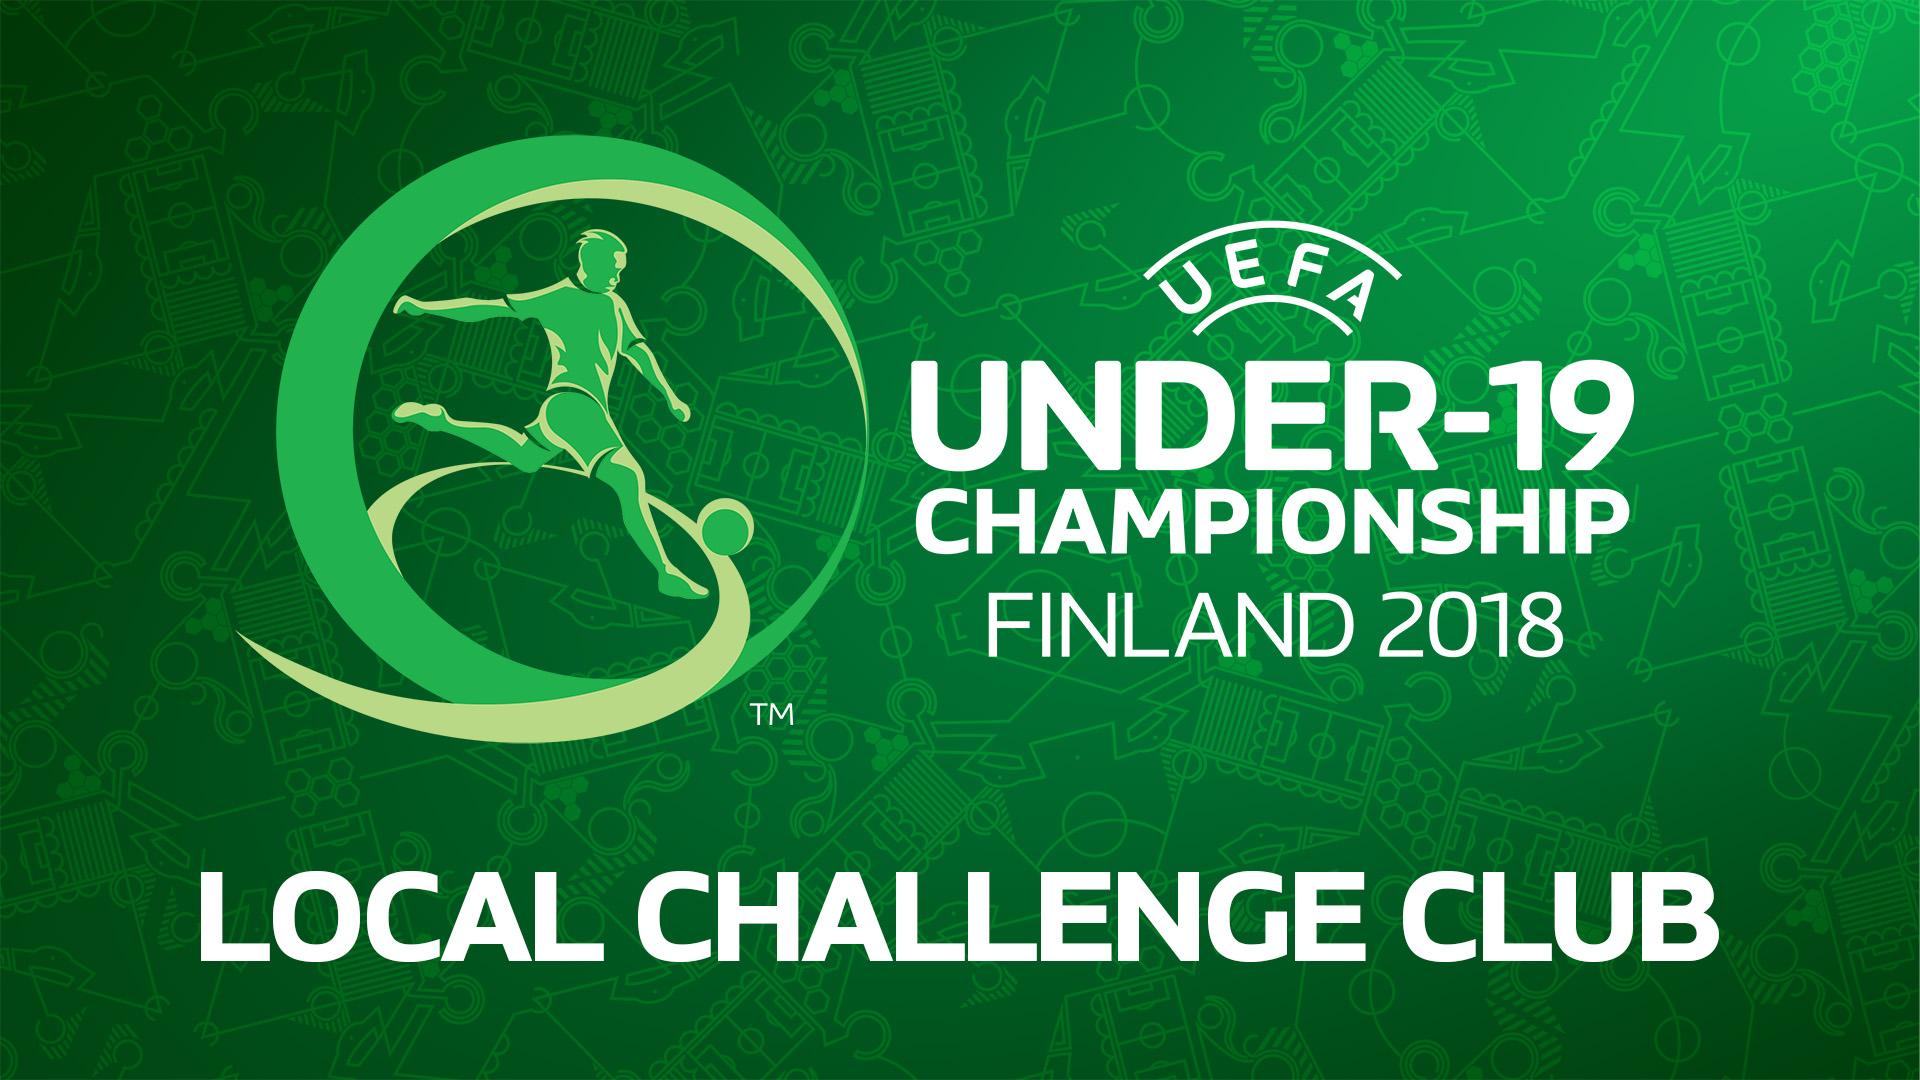 local challenge club.jpg